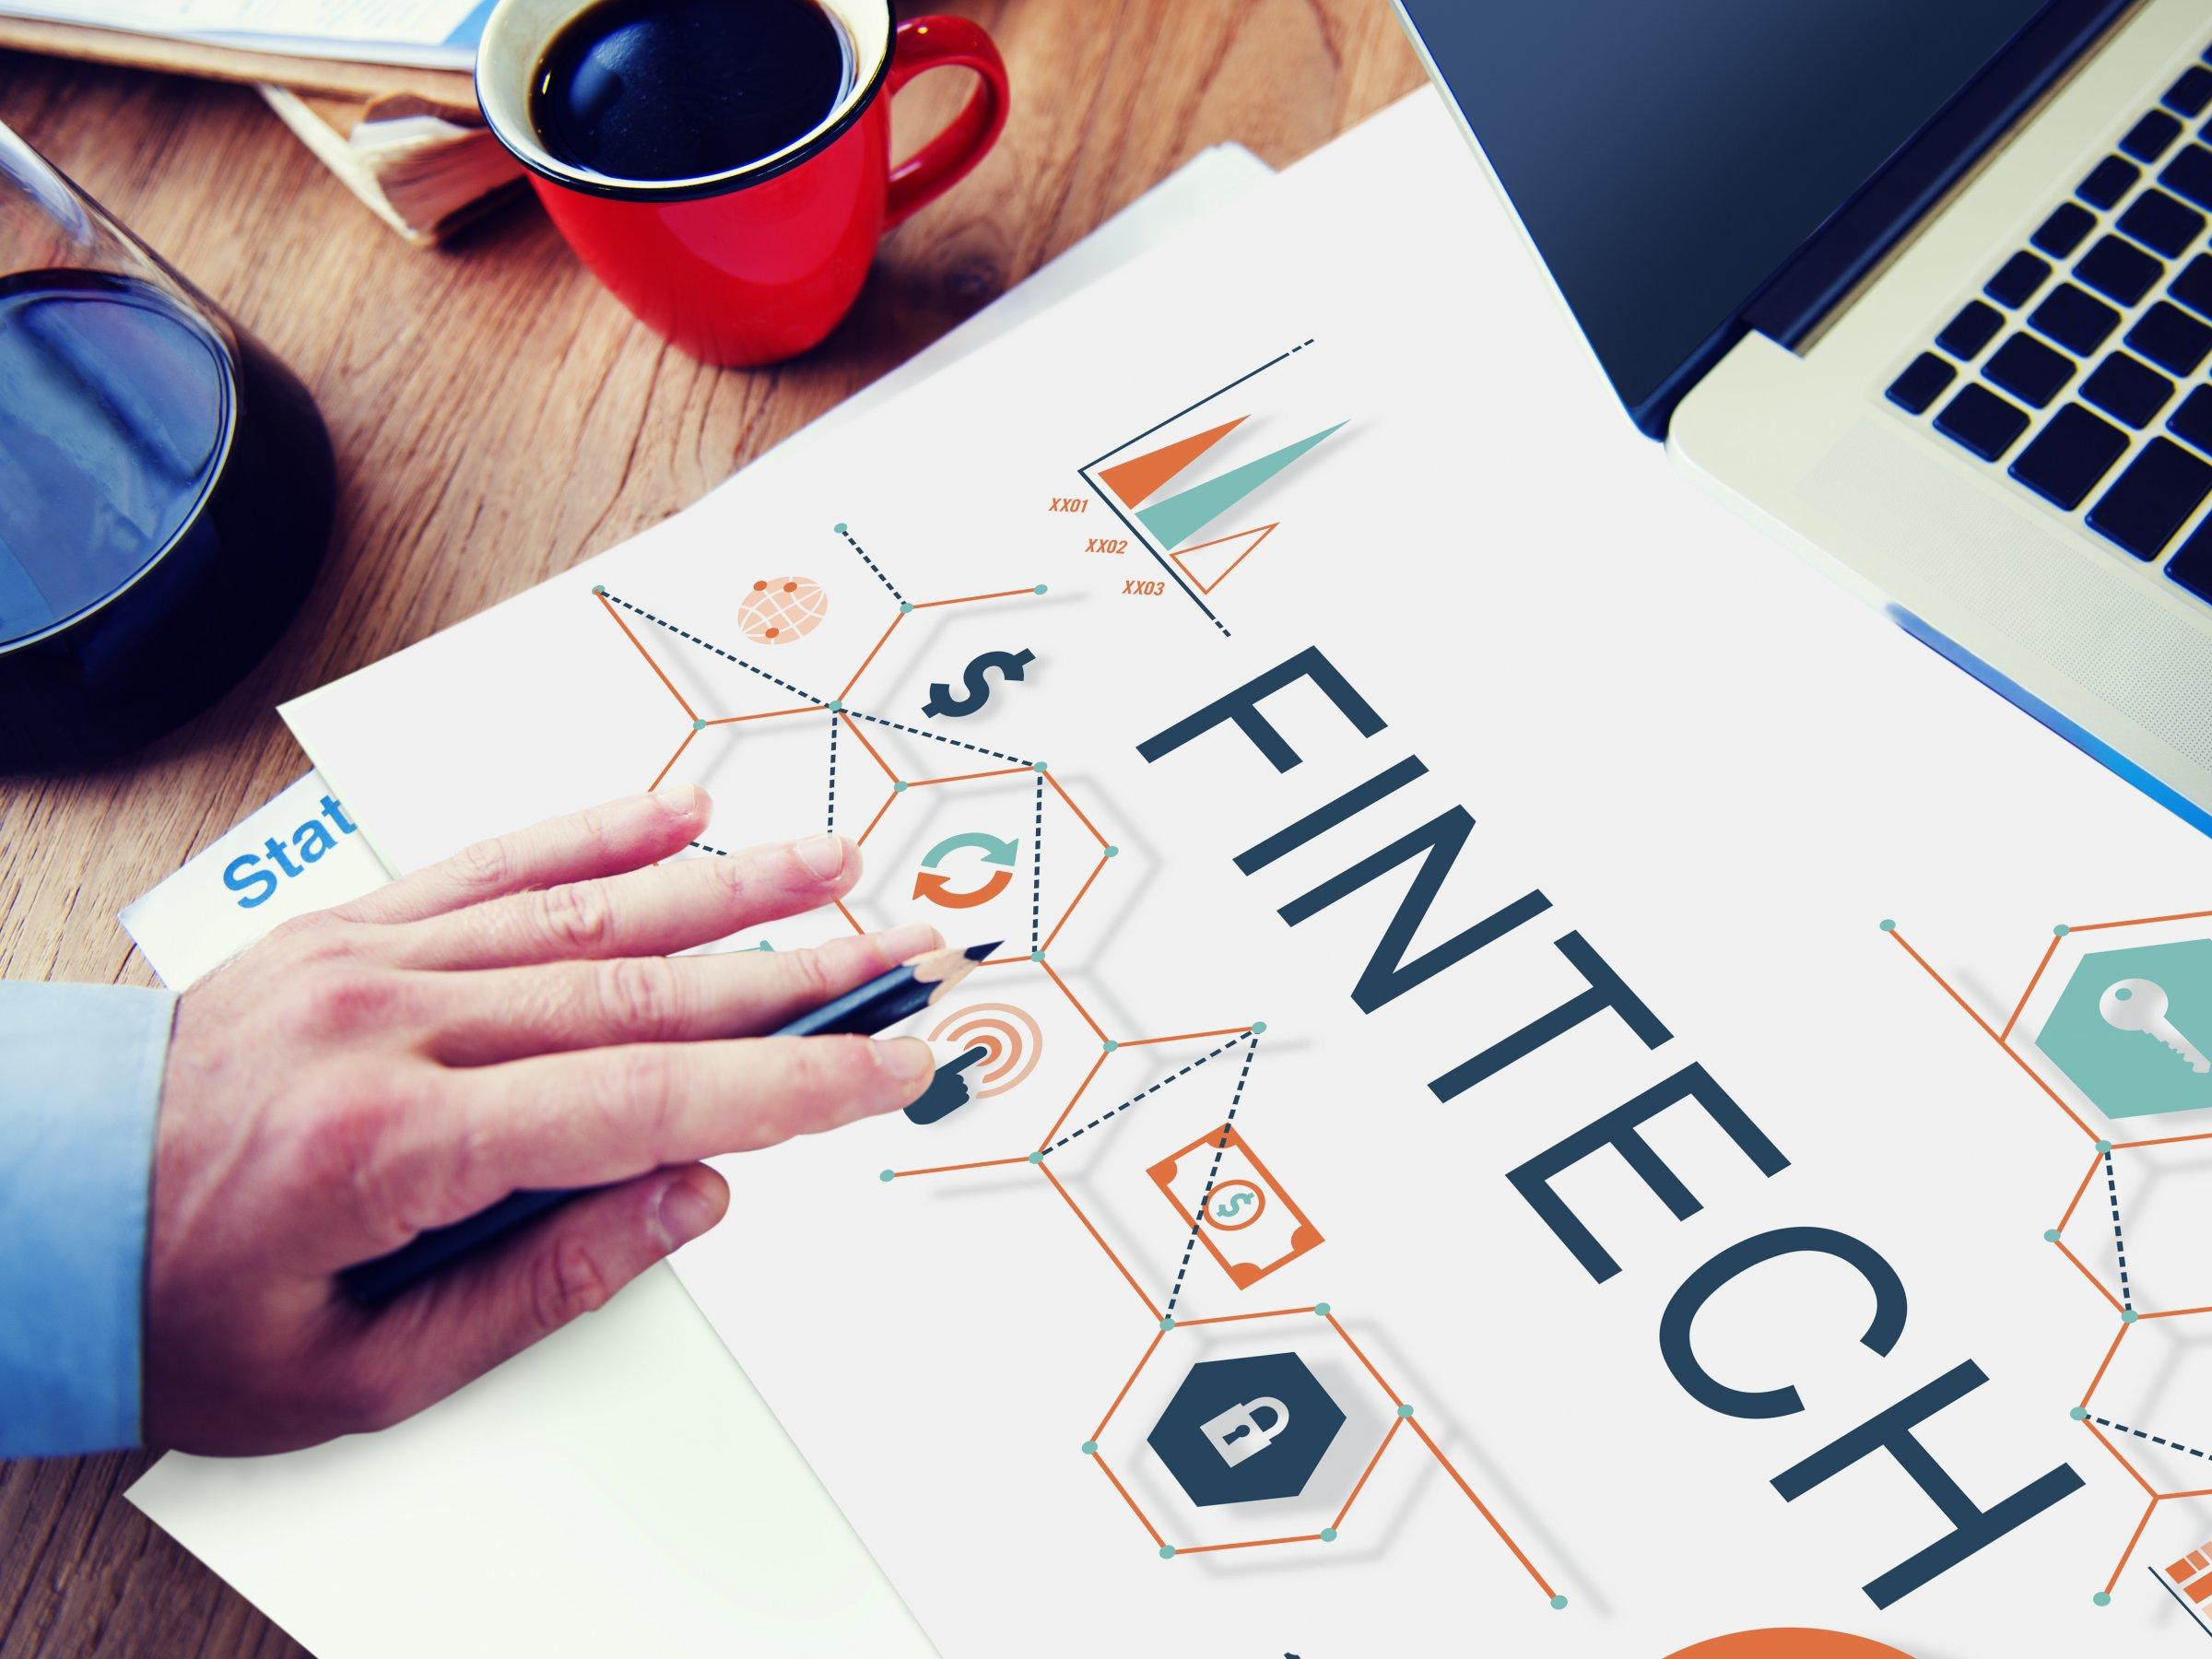 Fintech的发展趋势与监管逻辑